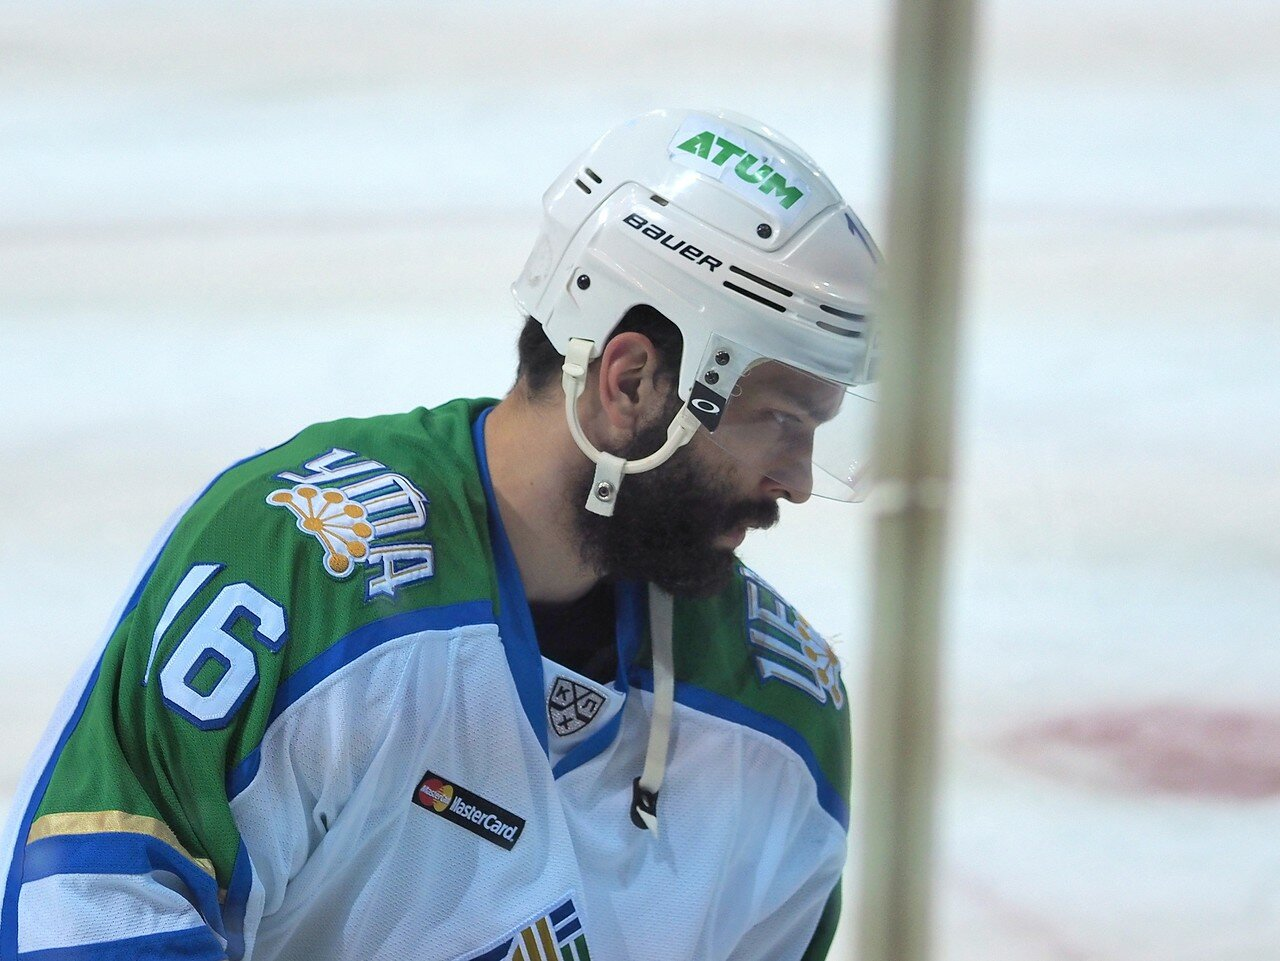 15Плей-офф 2016 Восток Финал Металлург - Салават Юлаев 31.03.2016